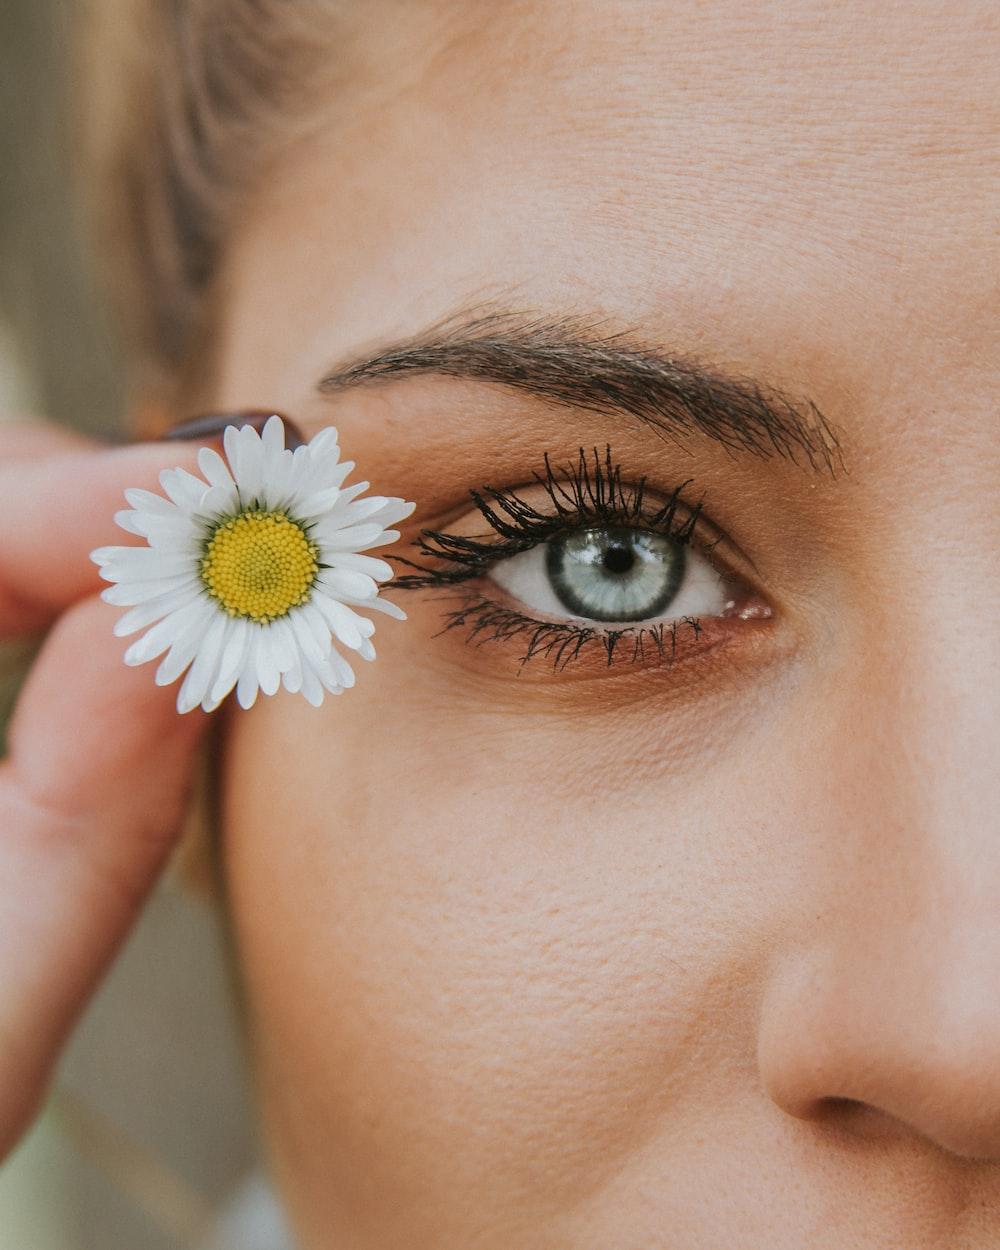 Eye pictures hq download free images on unsplash white petaled flower near woman eye izmirmasajfo